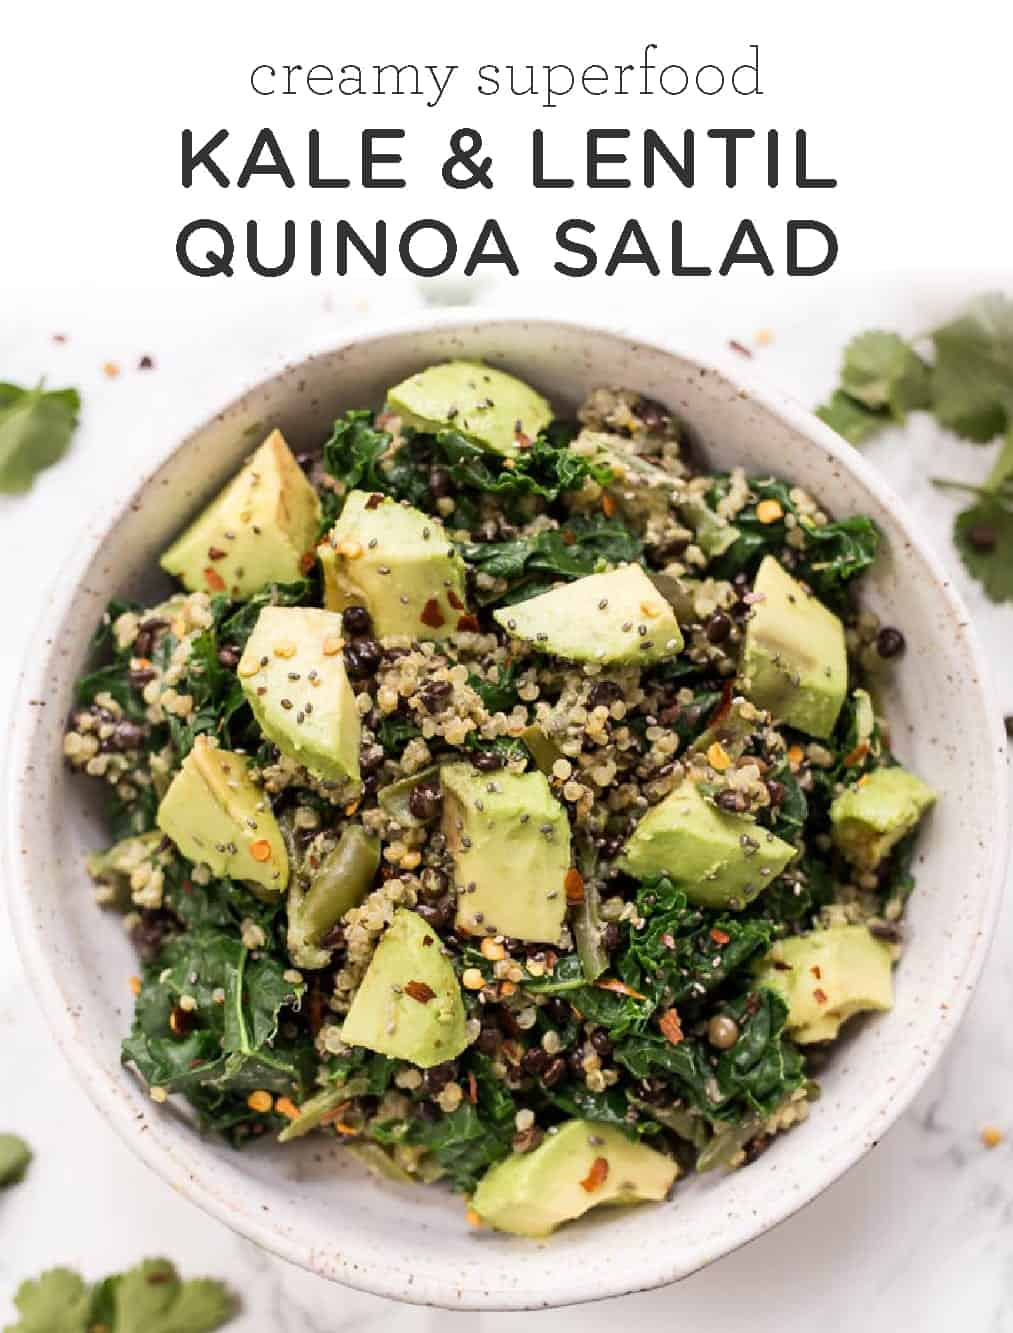 Creamy Superfood Kale & Lentil Quinoa Salad - Simply Quinoa